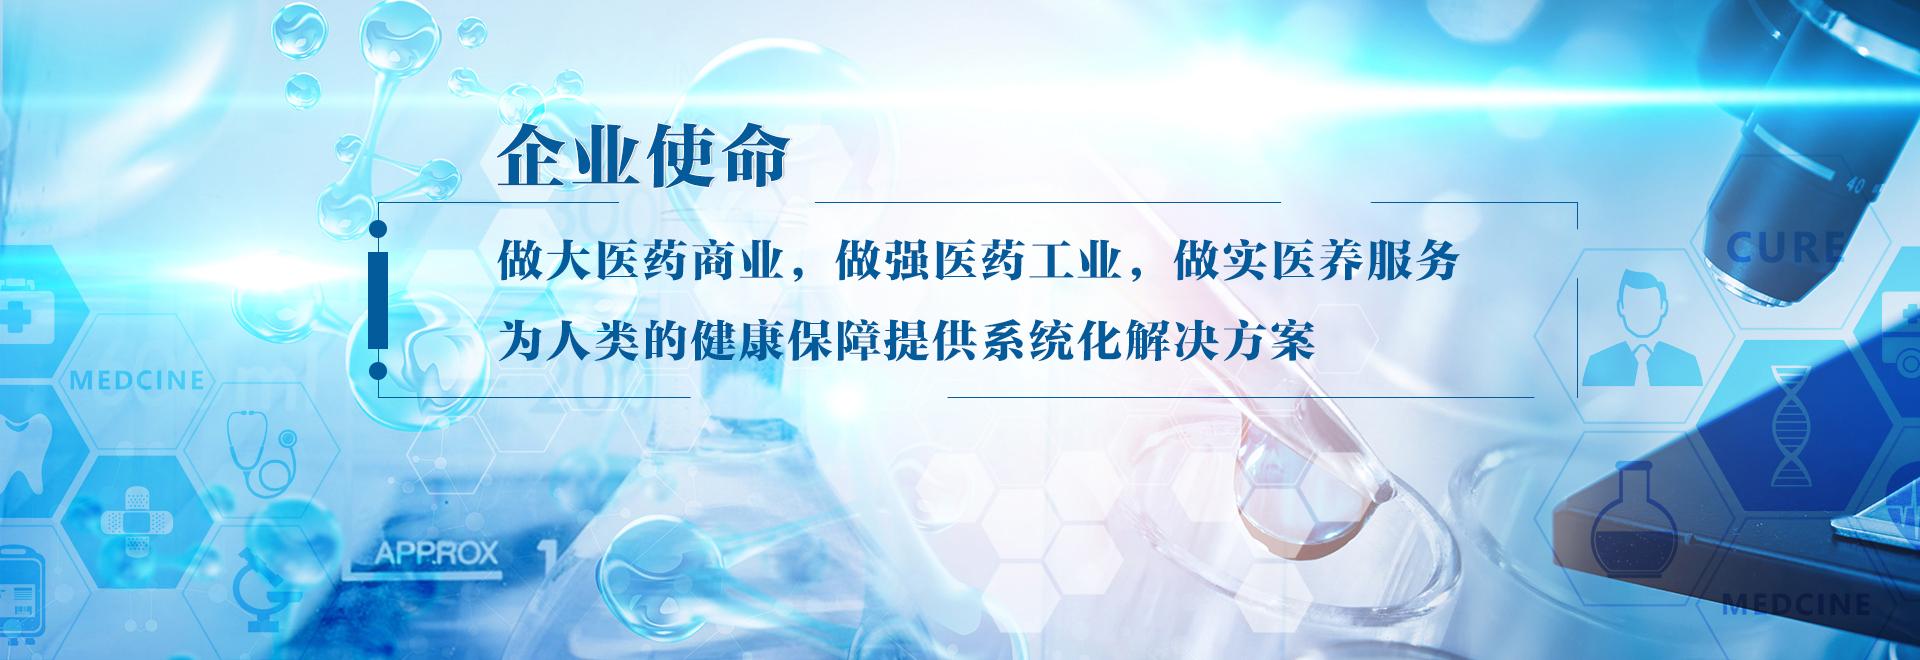 万博maxbetx官网app